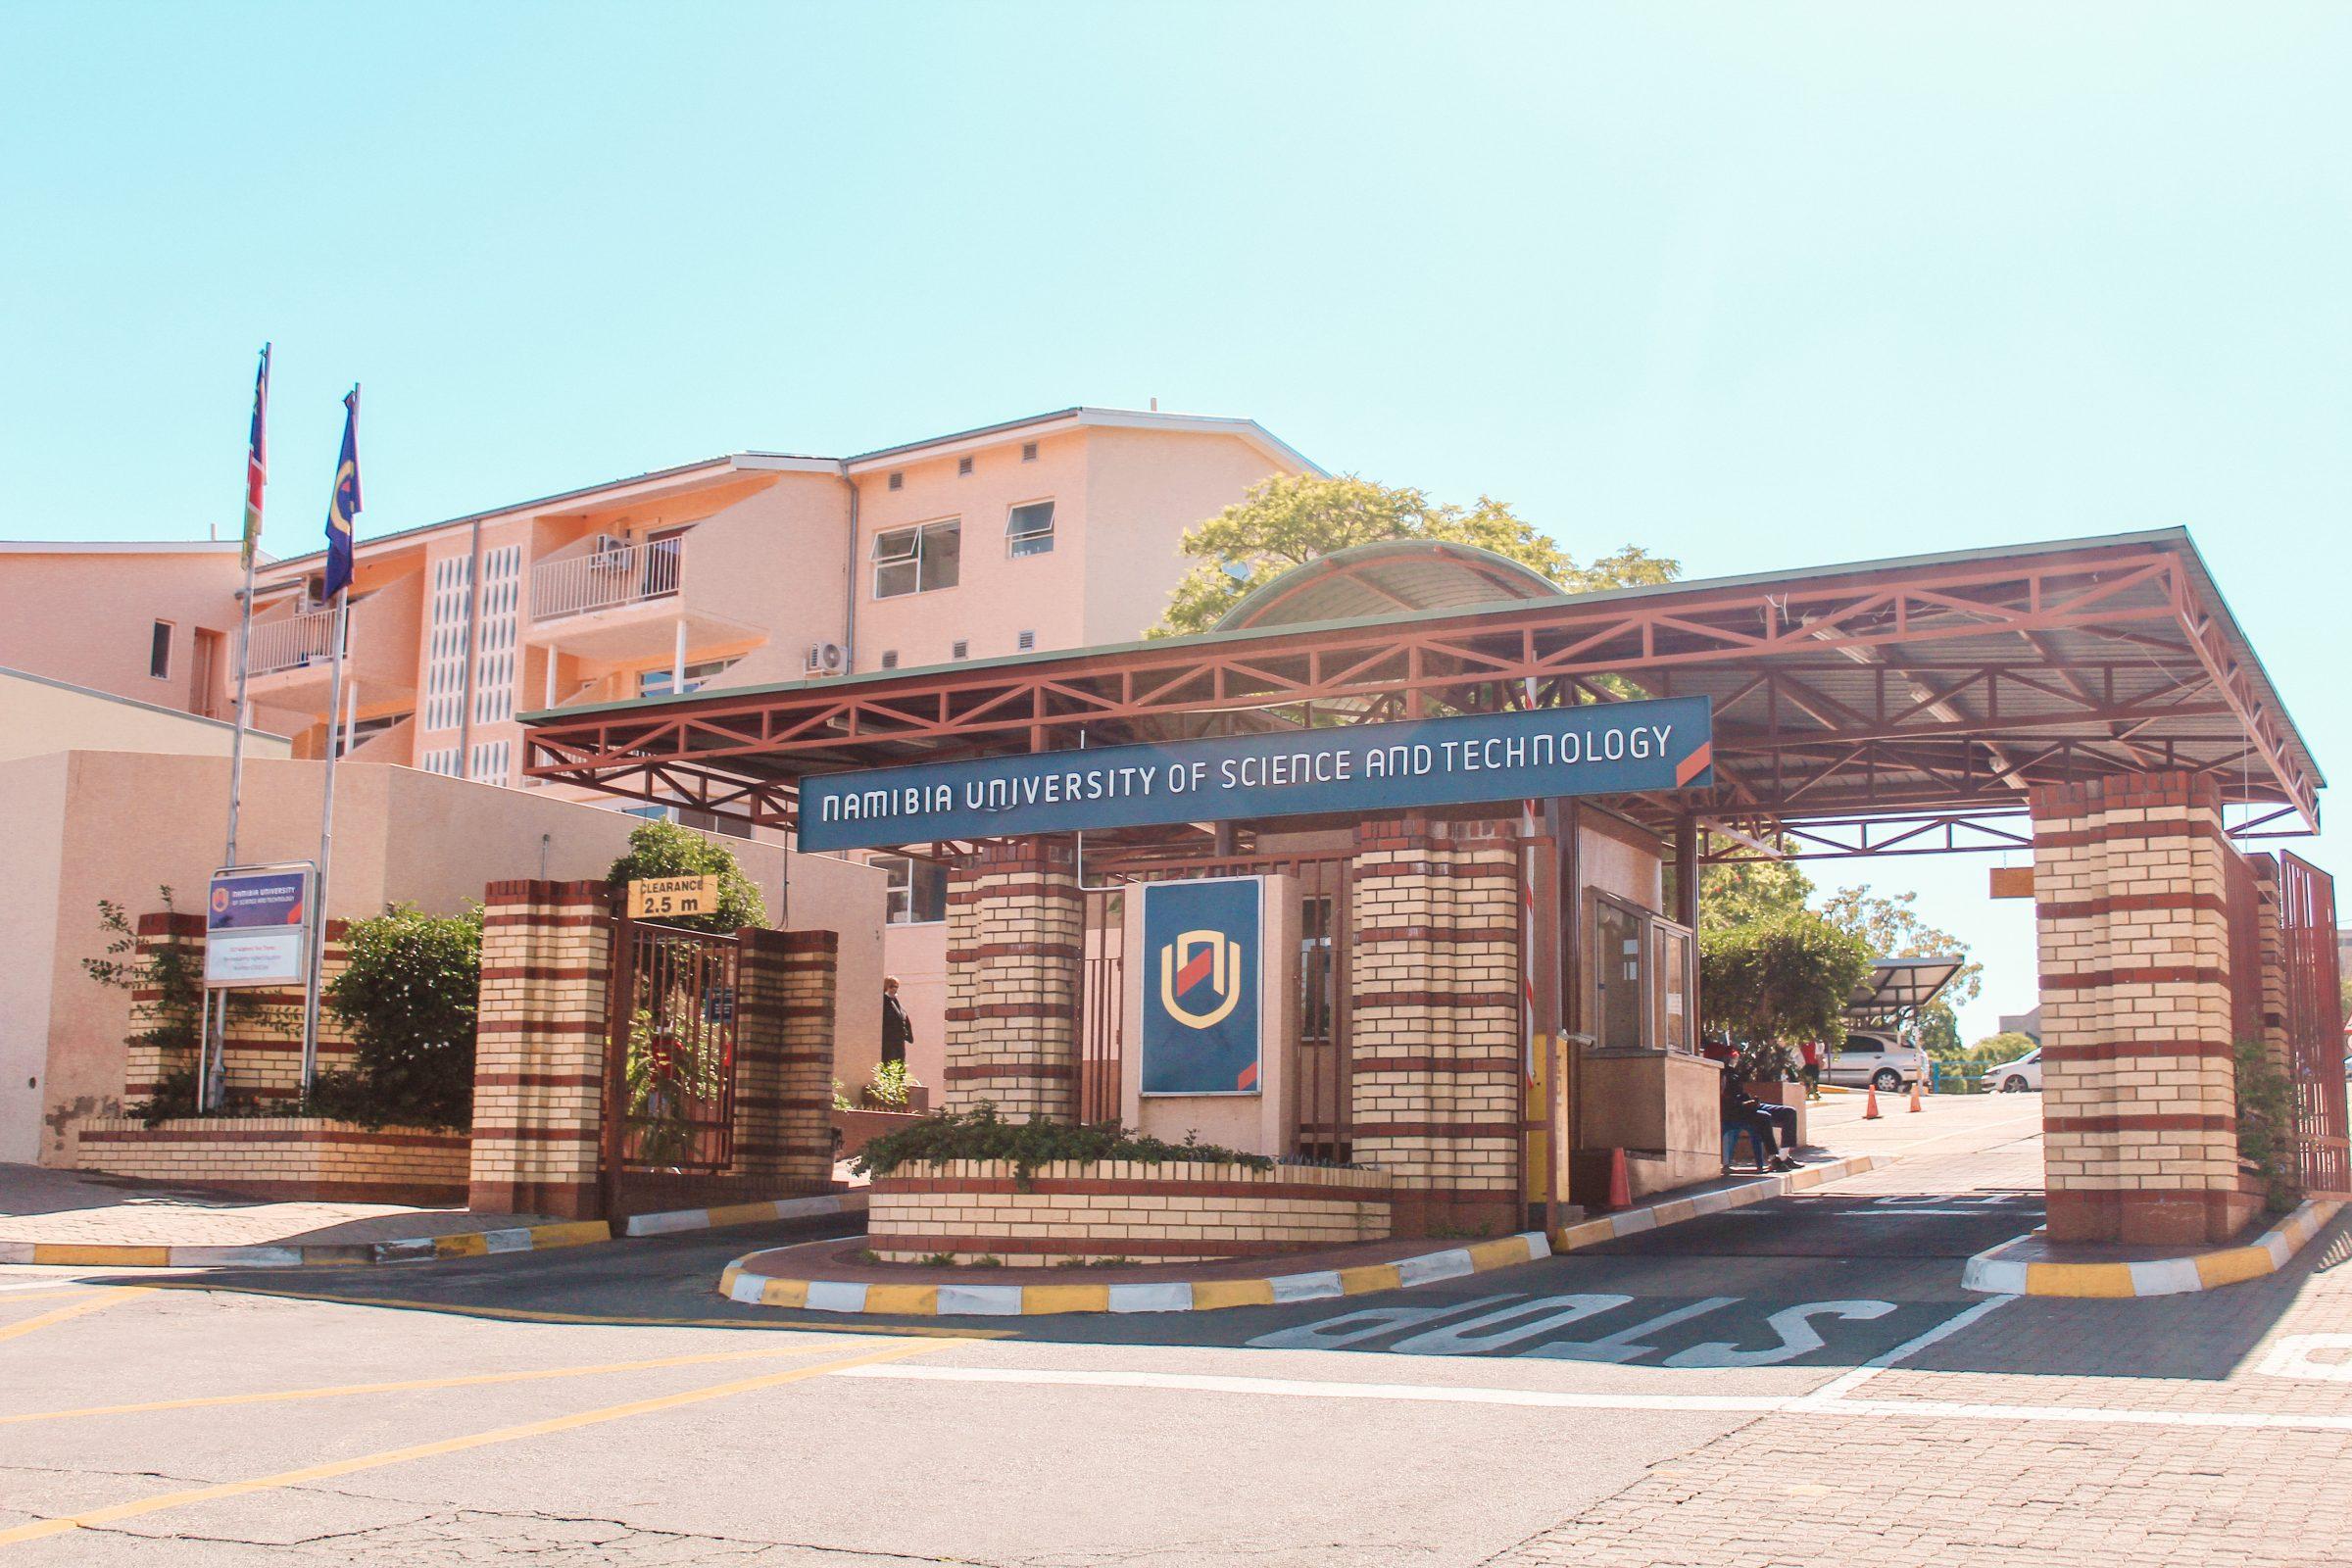 De hoofdingang van de Namibia University of Science and Technology